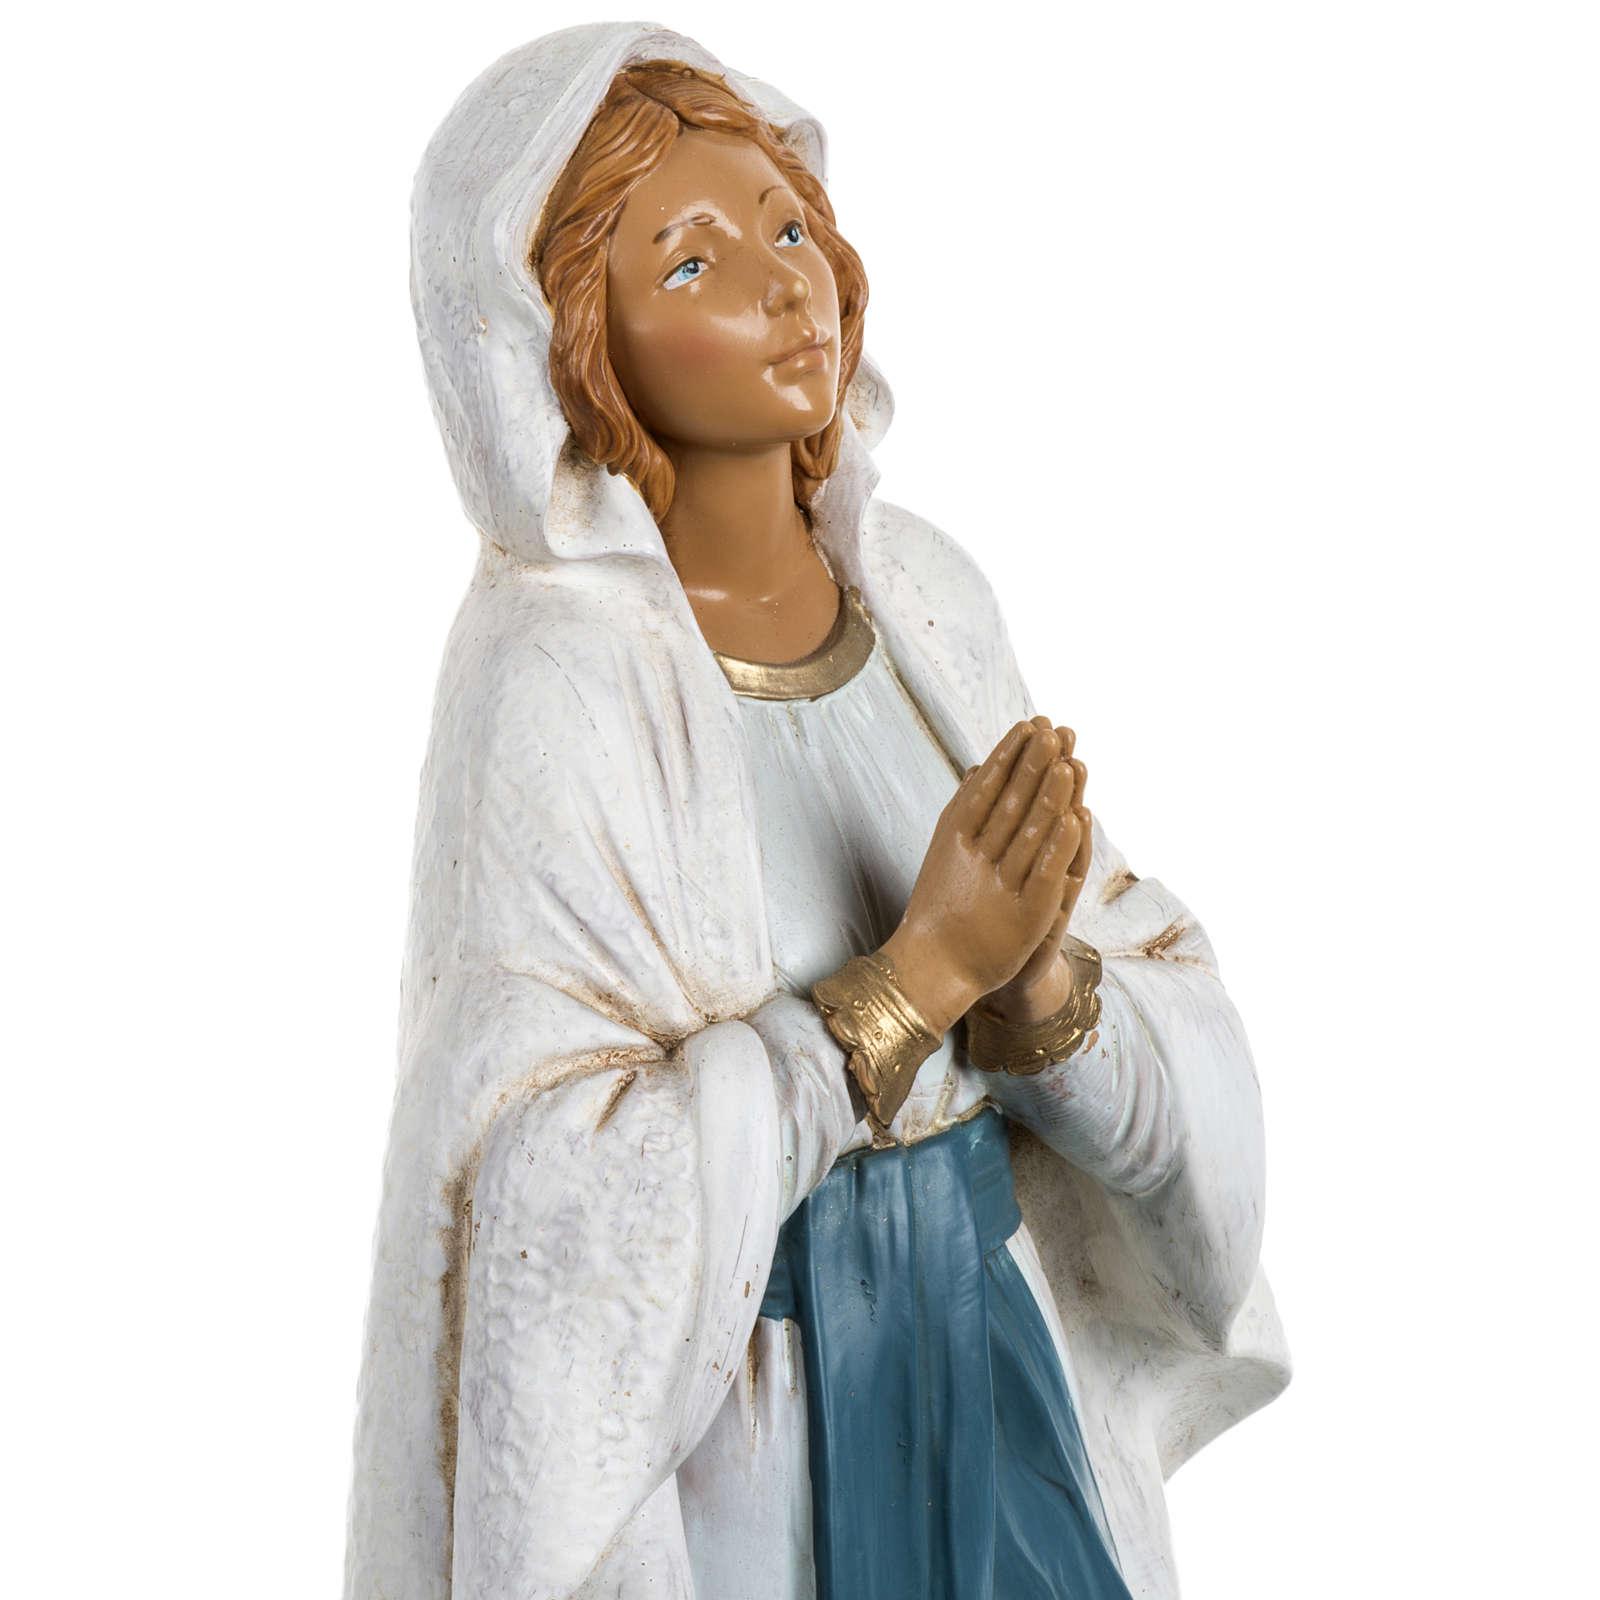 Nuestra señora de Lourdes 30 cm. Fontanini similar madera 4